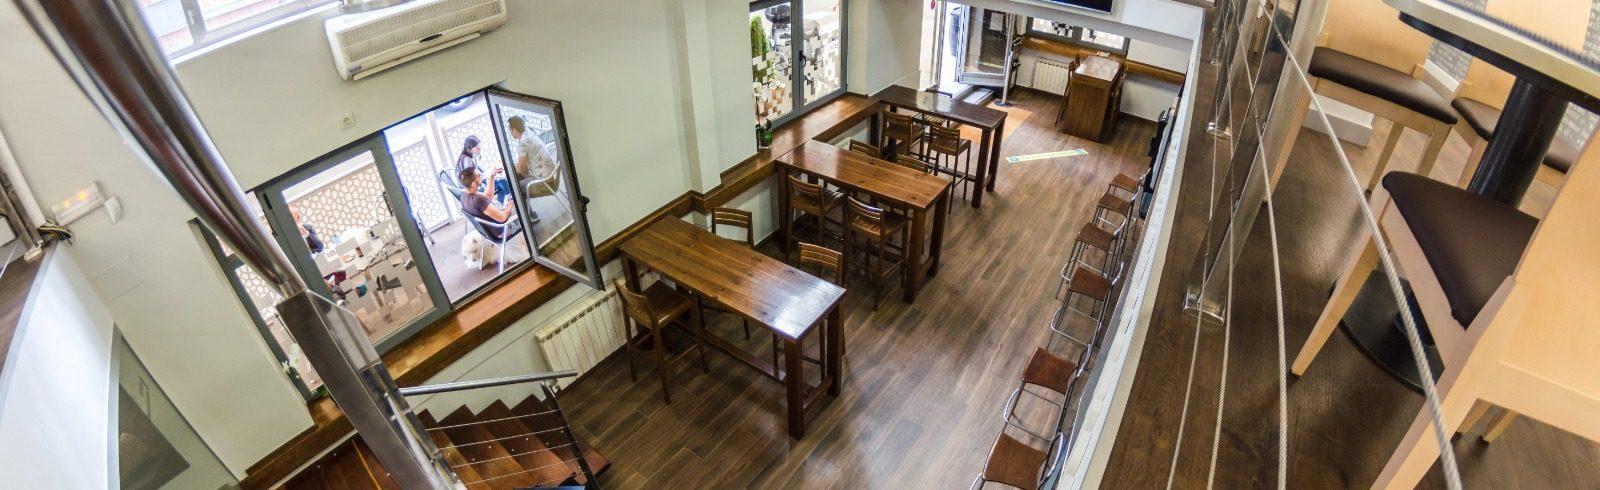 oasis zamora restaurante _hostal (53)